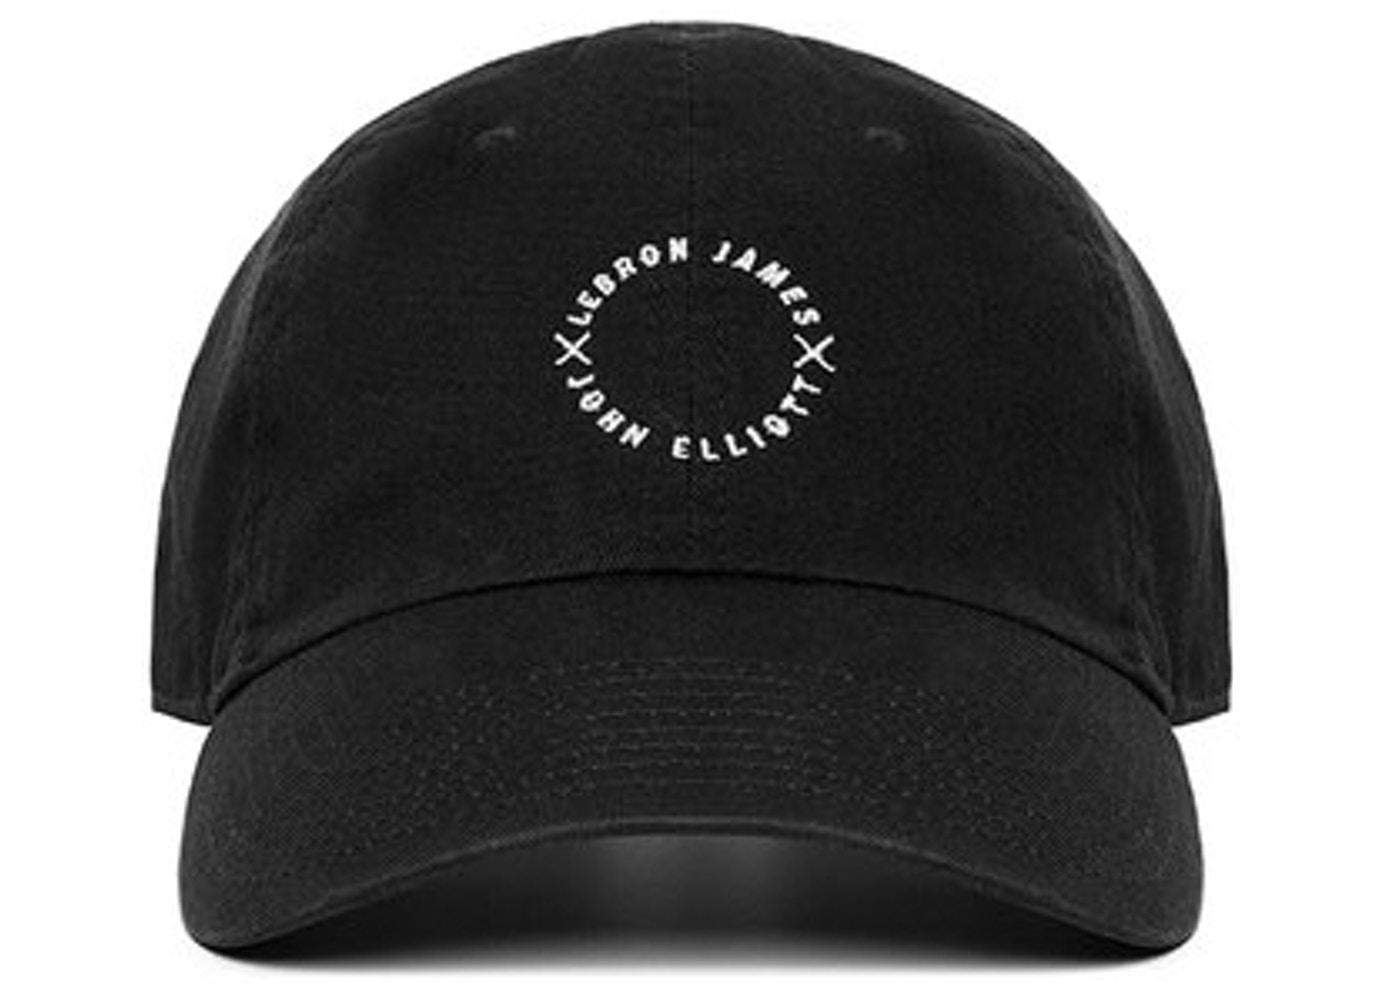 super popular 934fc f917a Nike Lebron James x John Elliott H86 Hat Black